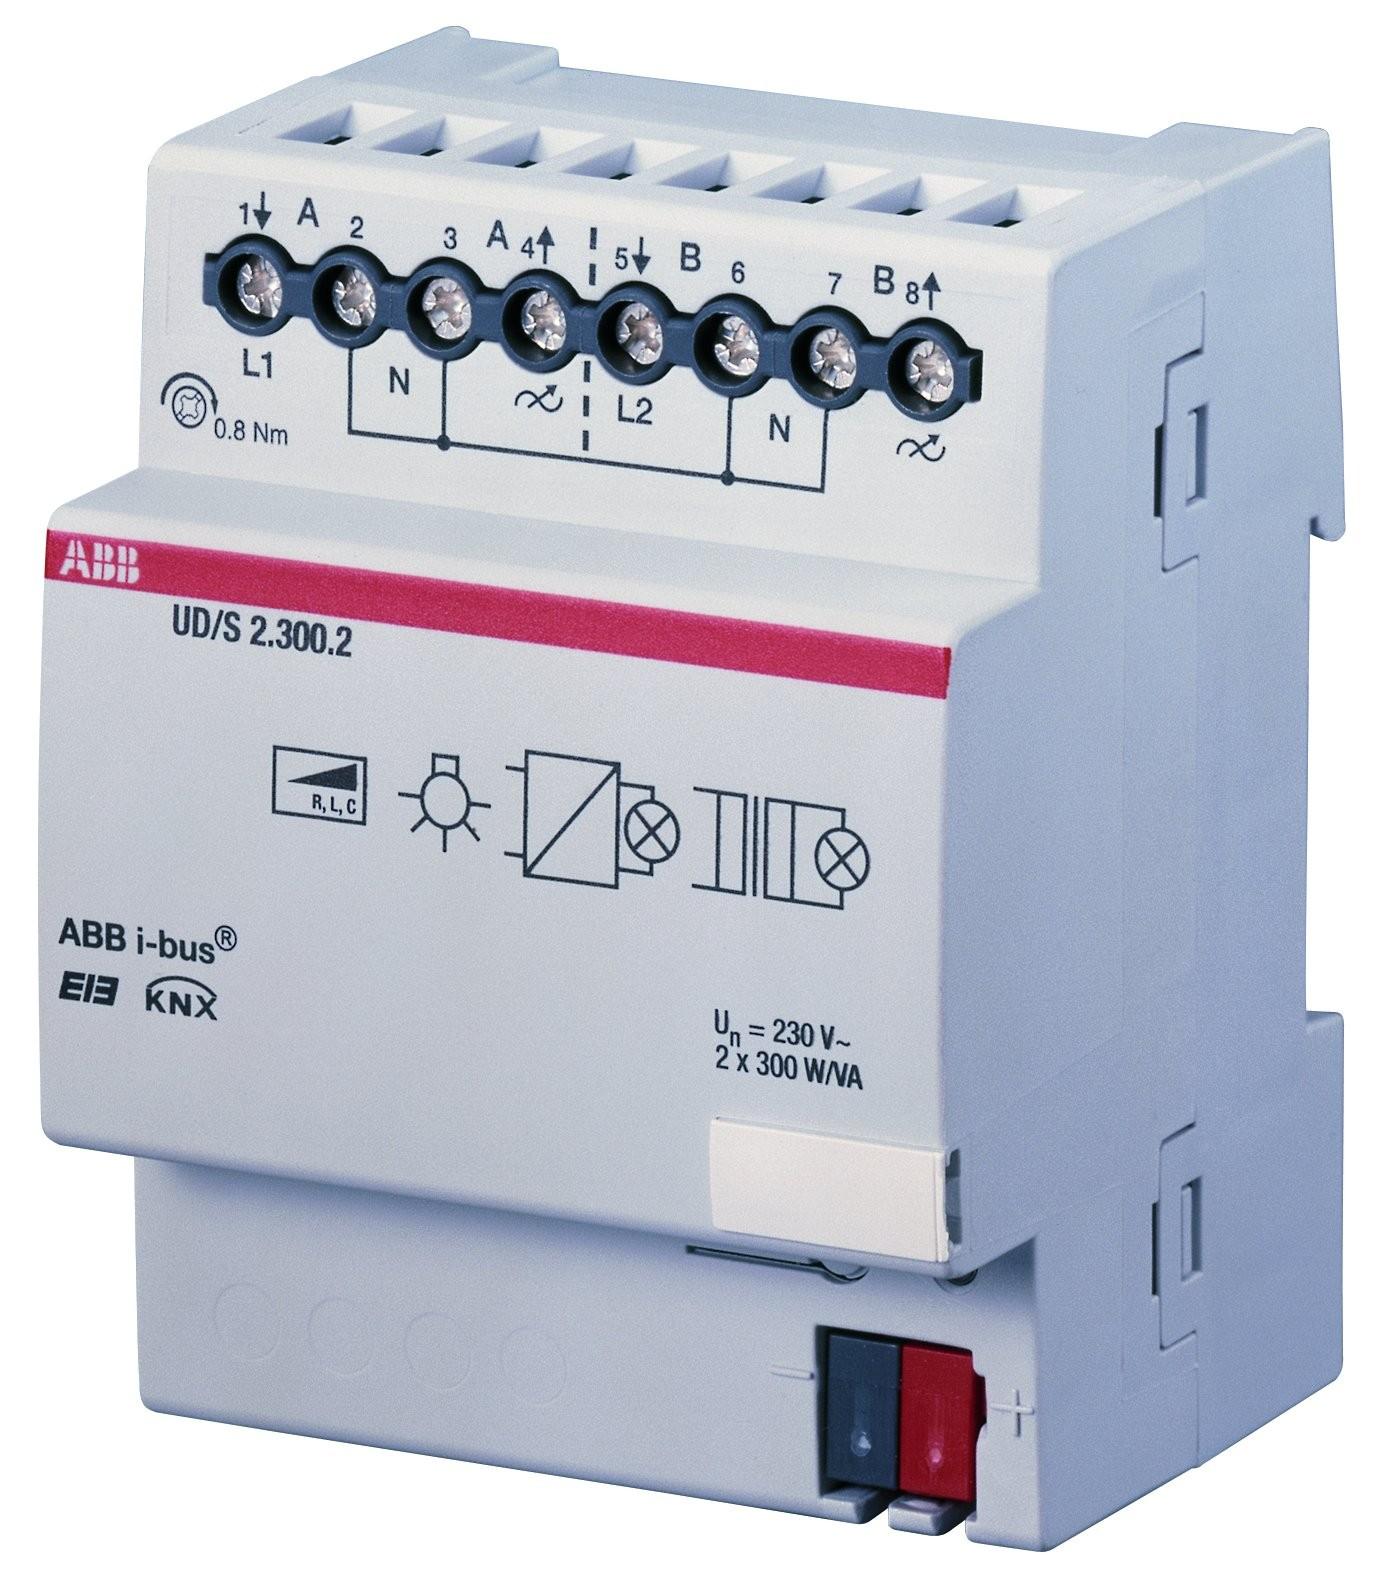 ABB Universal-Dimmaktor UD/S 2.300.2 2CDG110074R0011